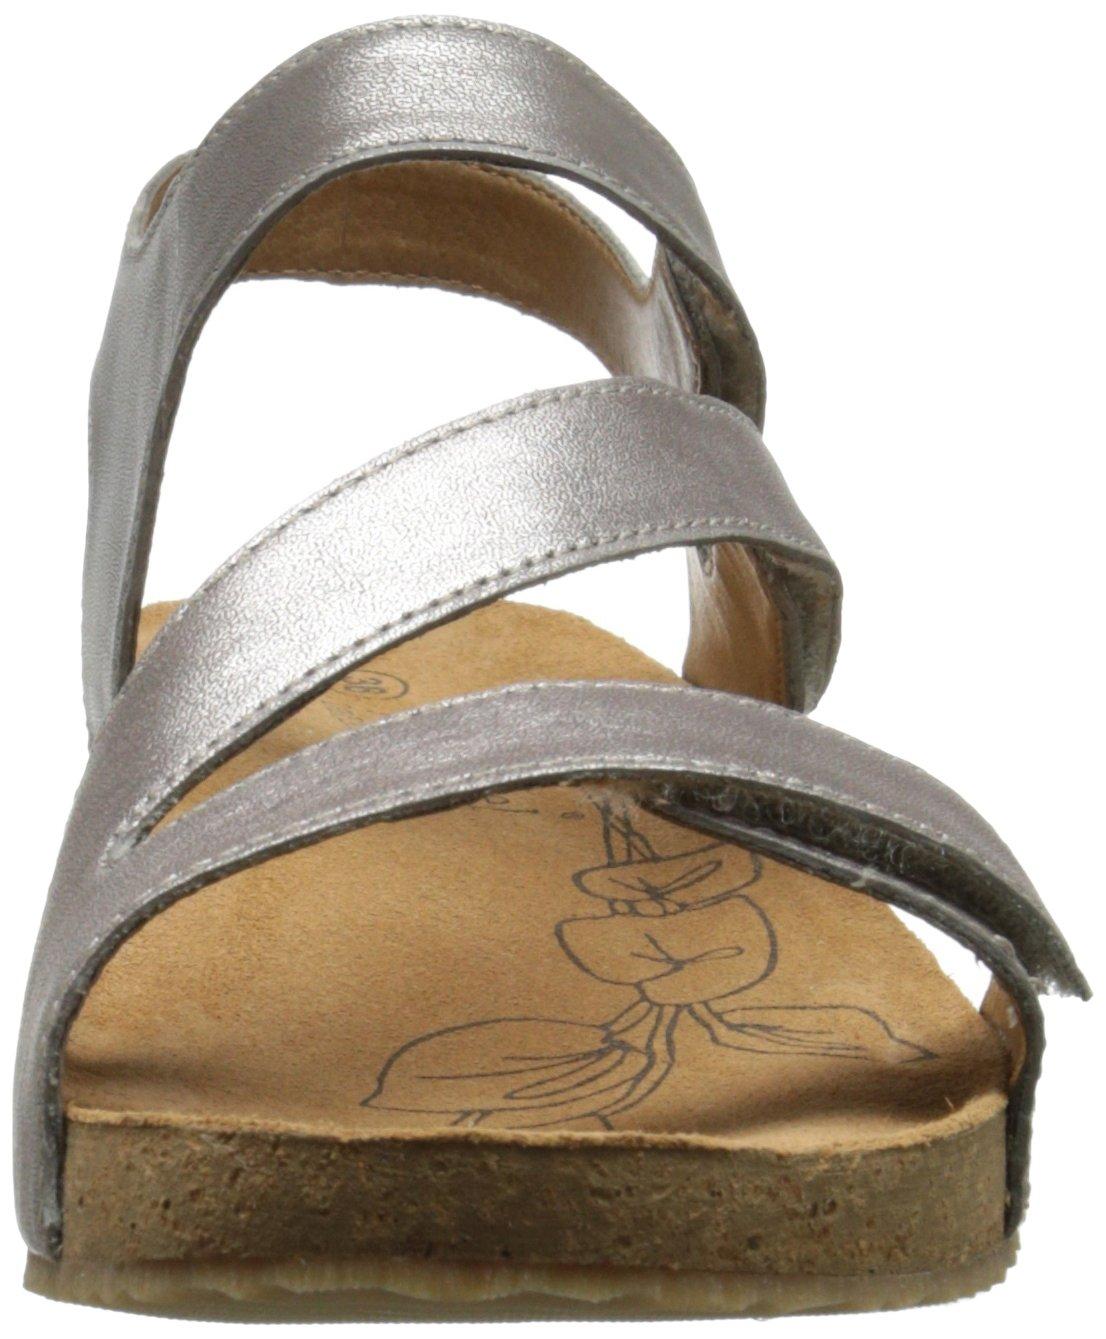 Josef Seibel Women's Tonga 25 dress Sandal, Cristal, 41 EU/10-10.5 M US by Josef Seibel (Image #4)